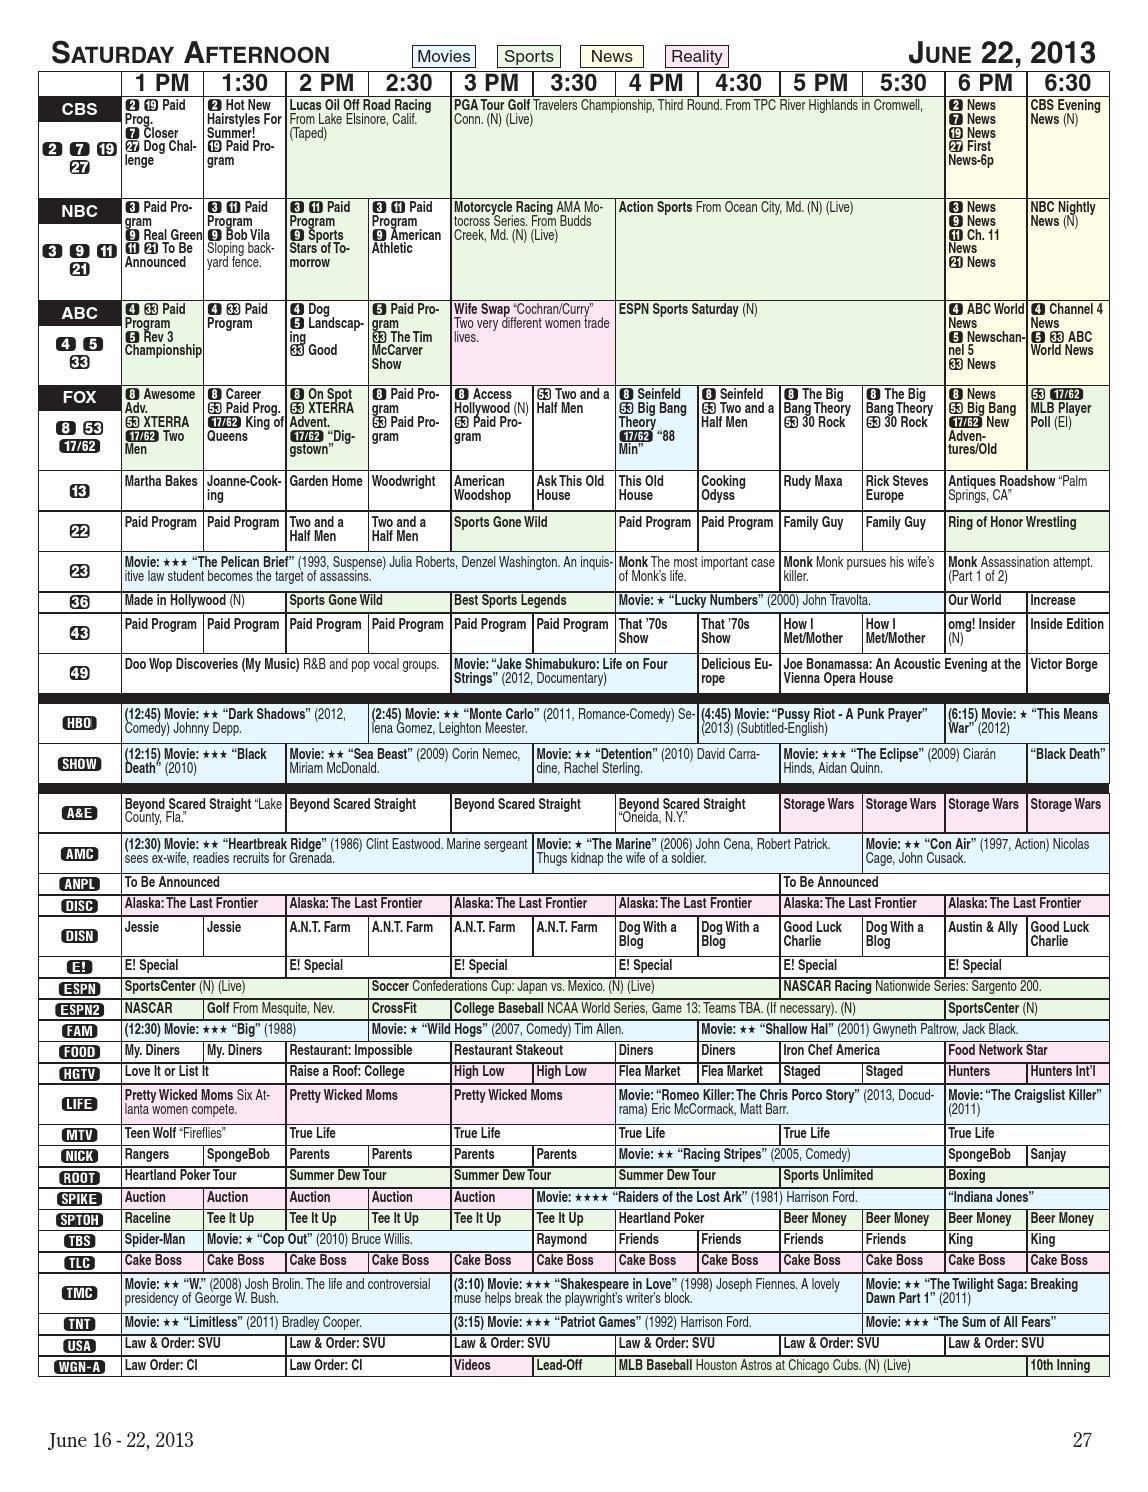 Morning Journal - TV Listings 6-16 - 6-22-2013 by Morning